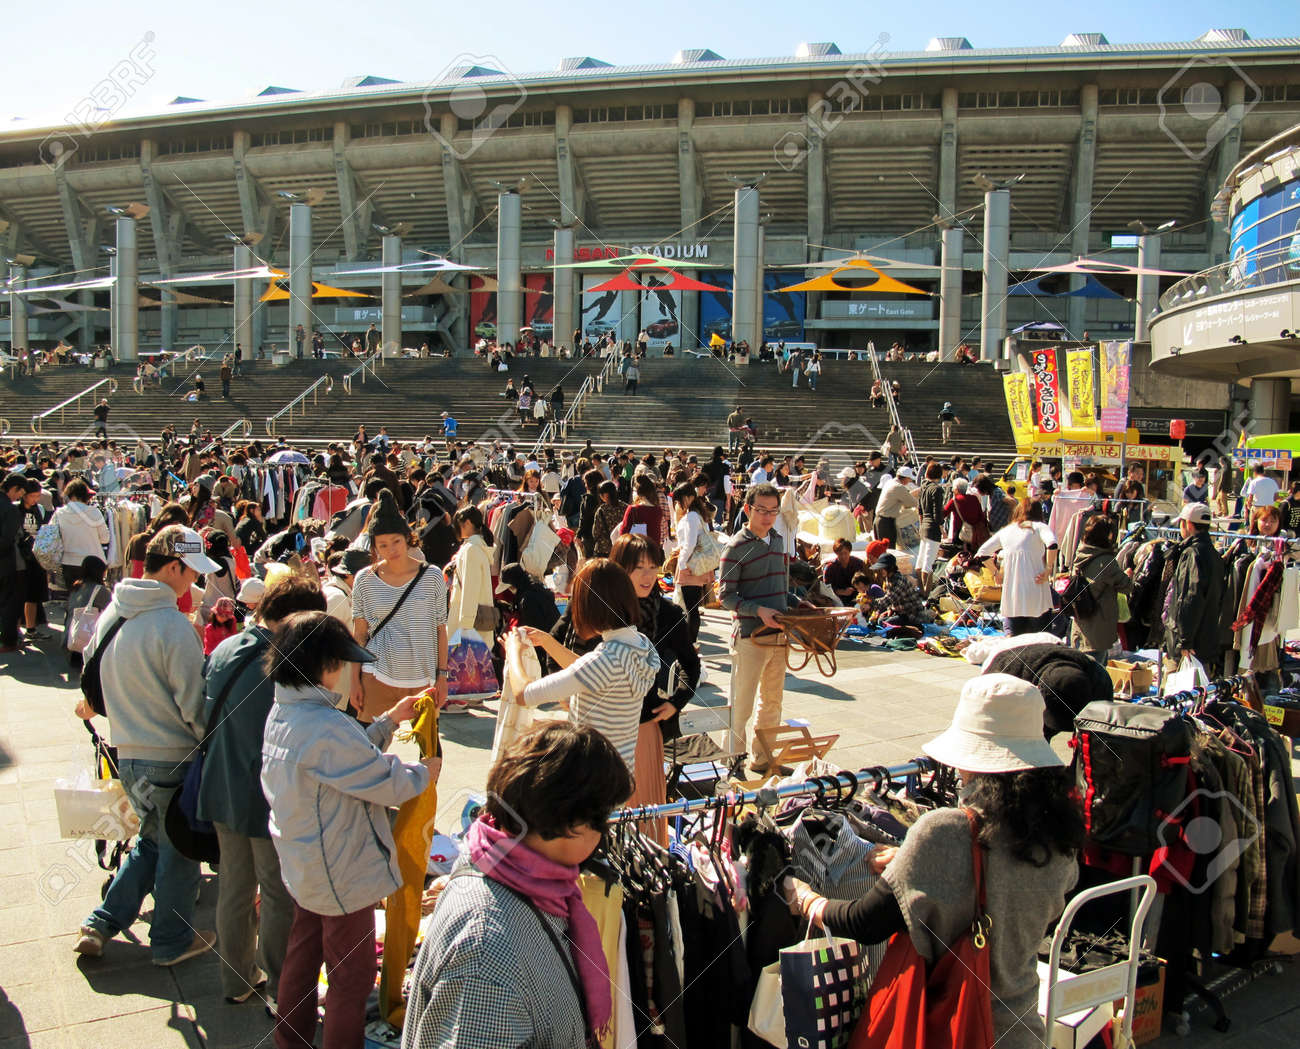 YOKOHAMA,JAPAN - NOVEMBER 4, 2012: Shoppers come to flea market at Nissan Stadium. It is the monthly flea market in Shin-Yokohama. Stock Photo - 17262305